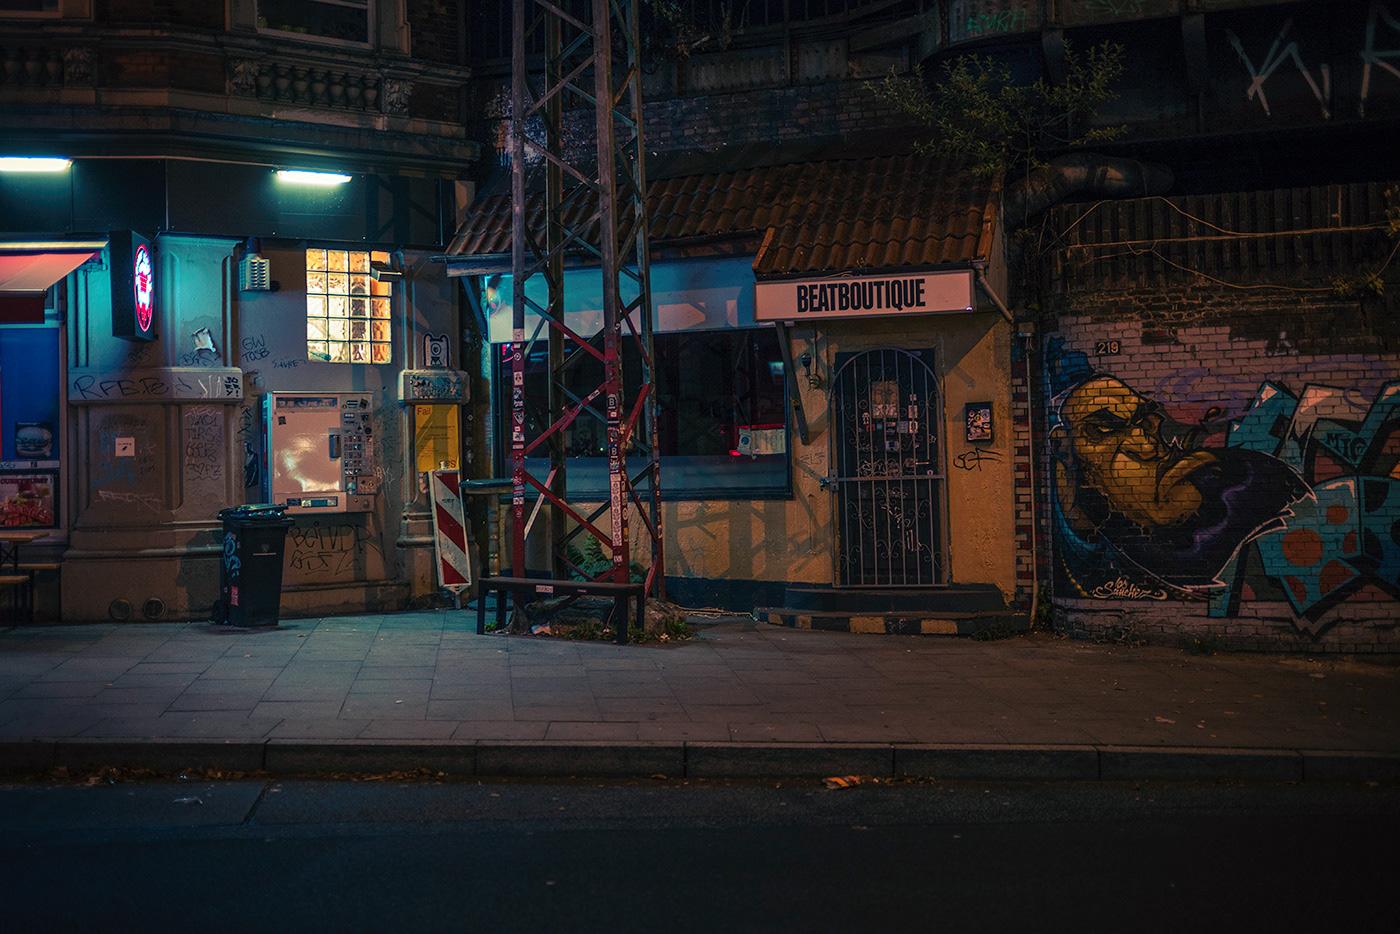 lowlight night Photography